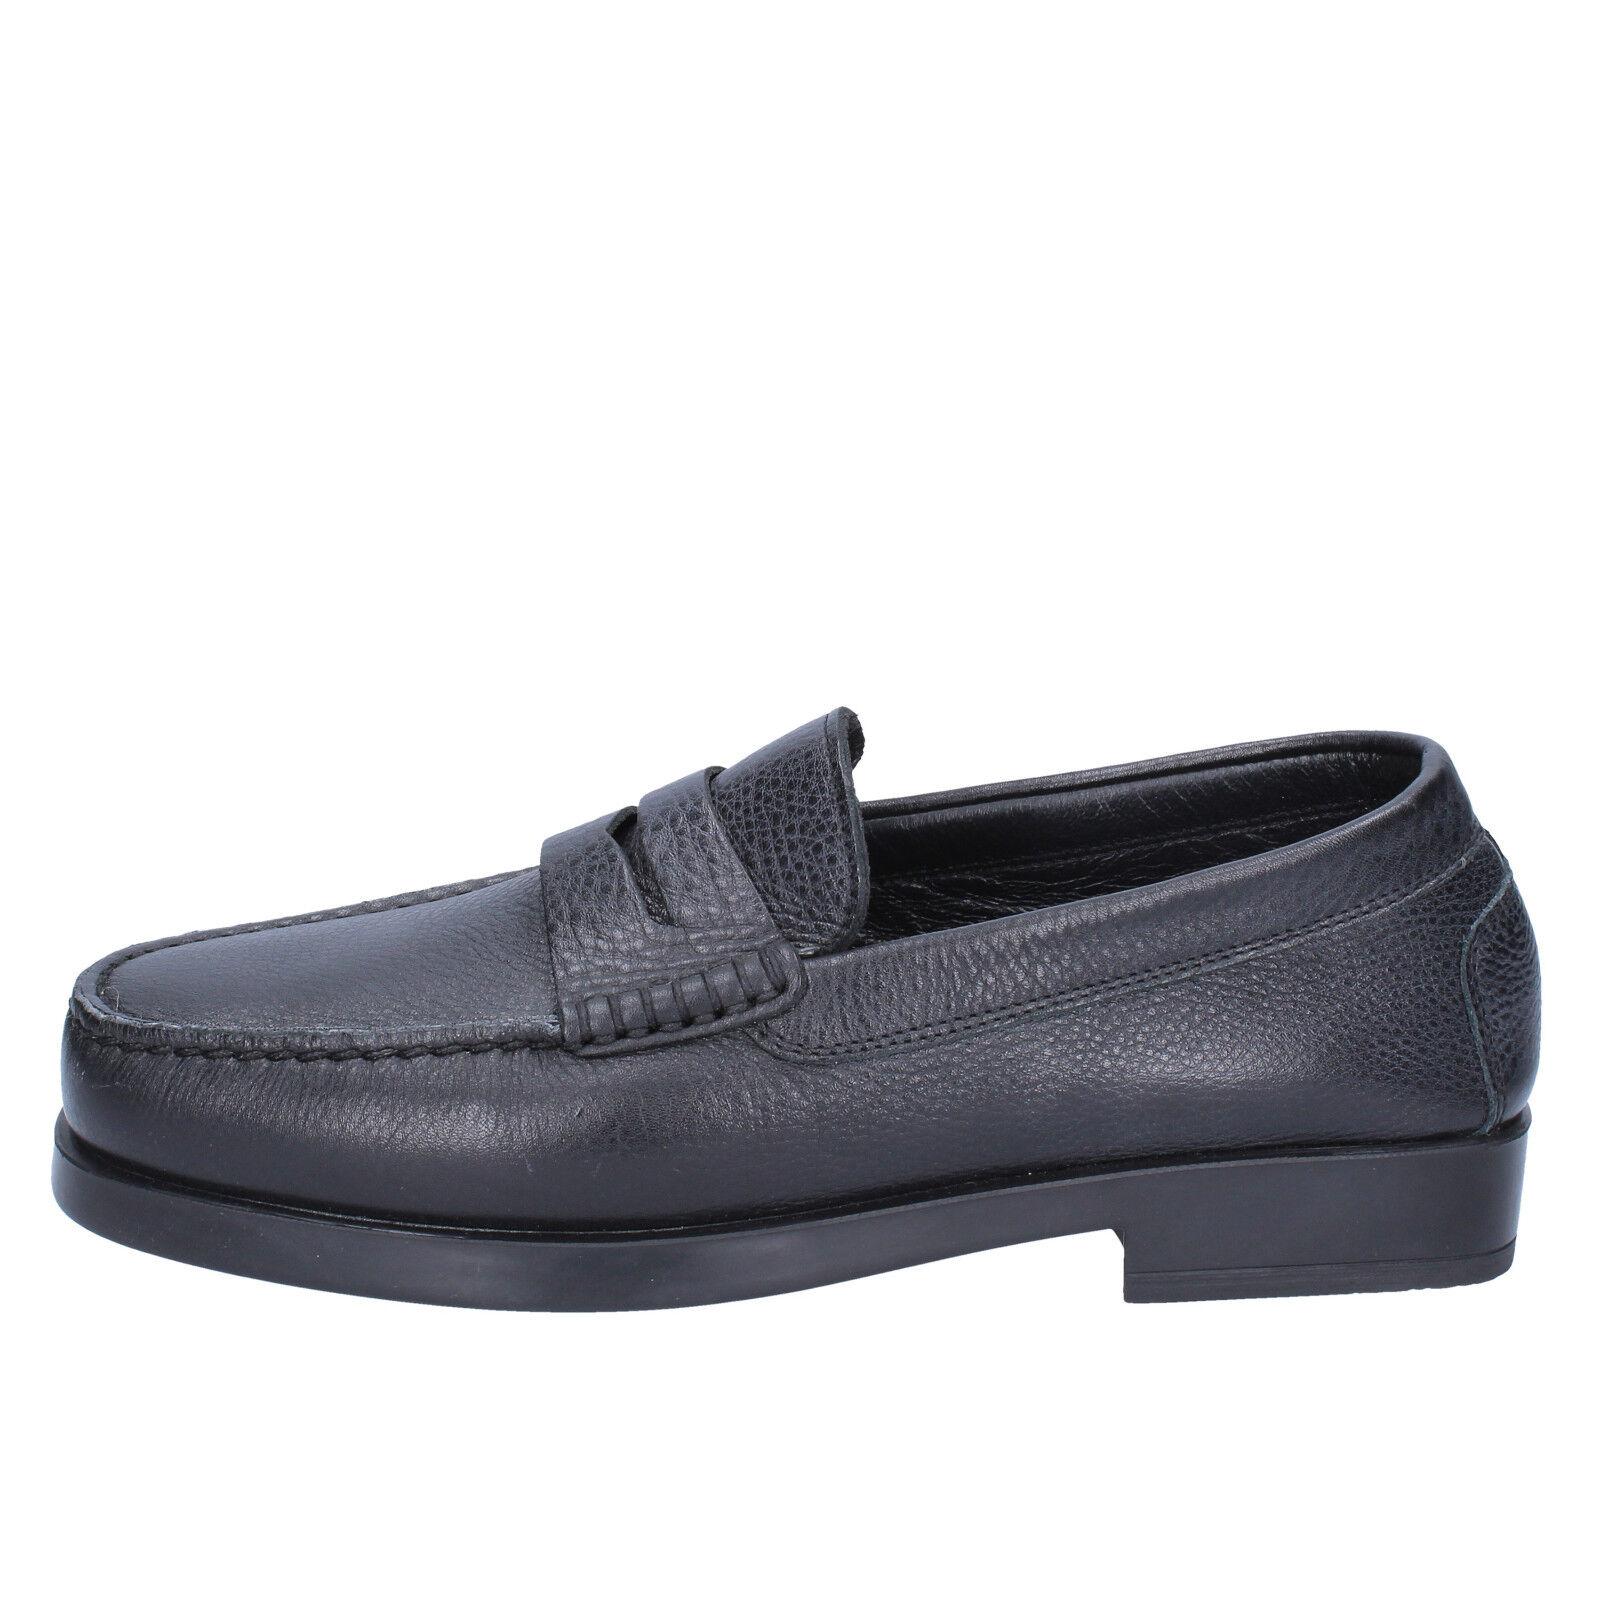 scarpe 40 uomo K852 & SON 40 scarpe mocassini nero pelle BX610-40 b51e34